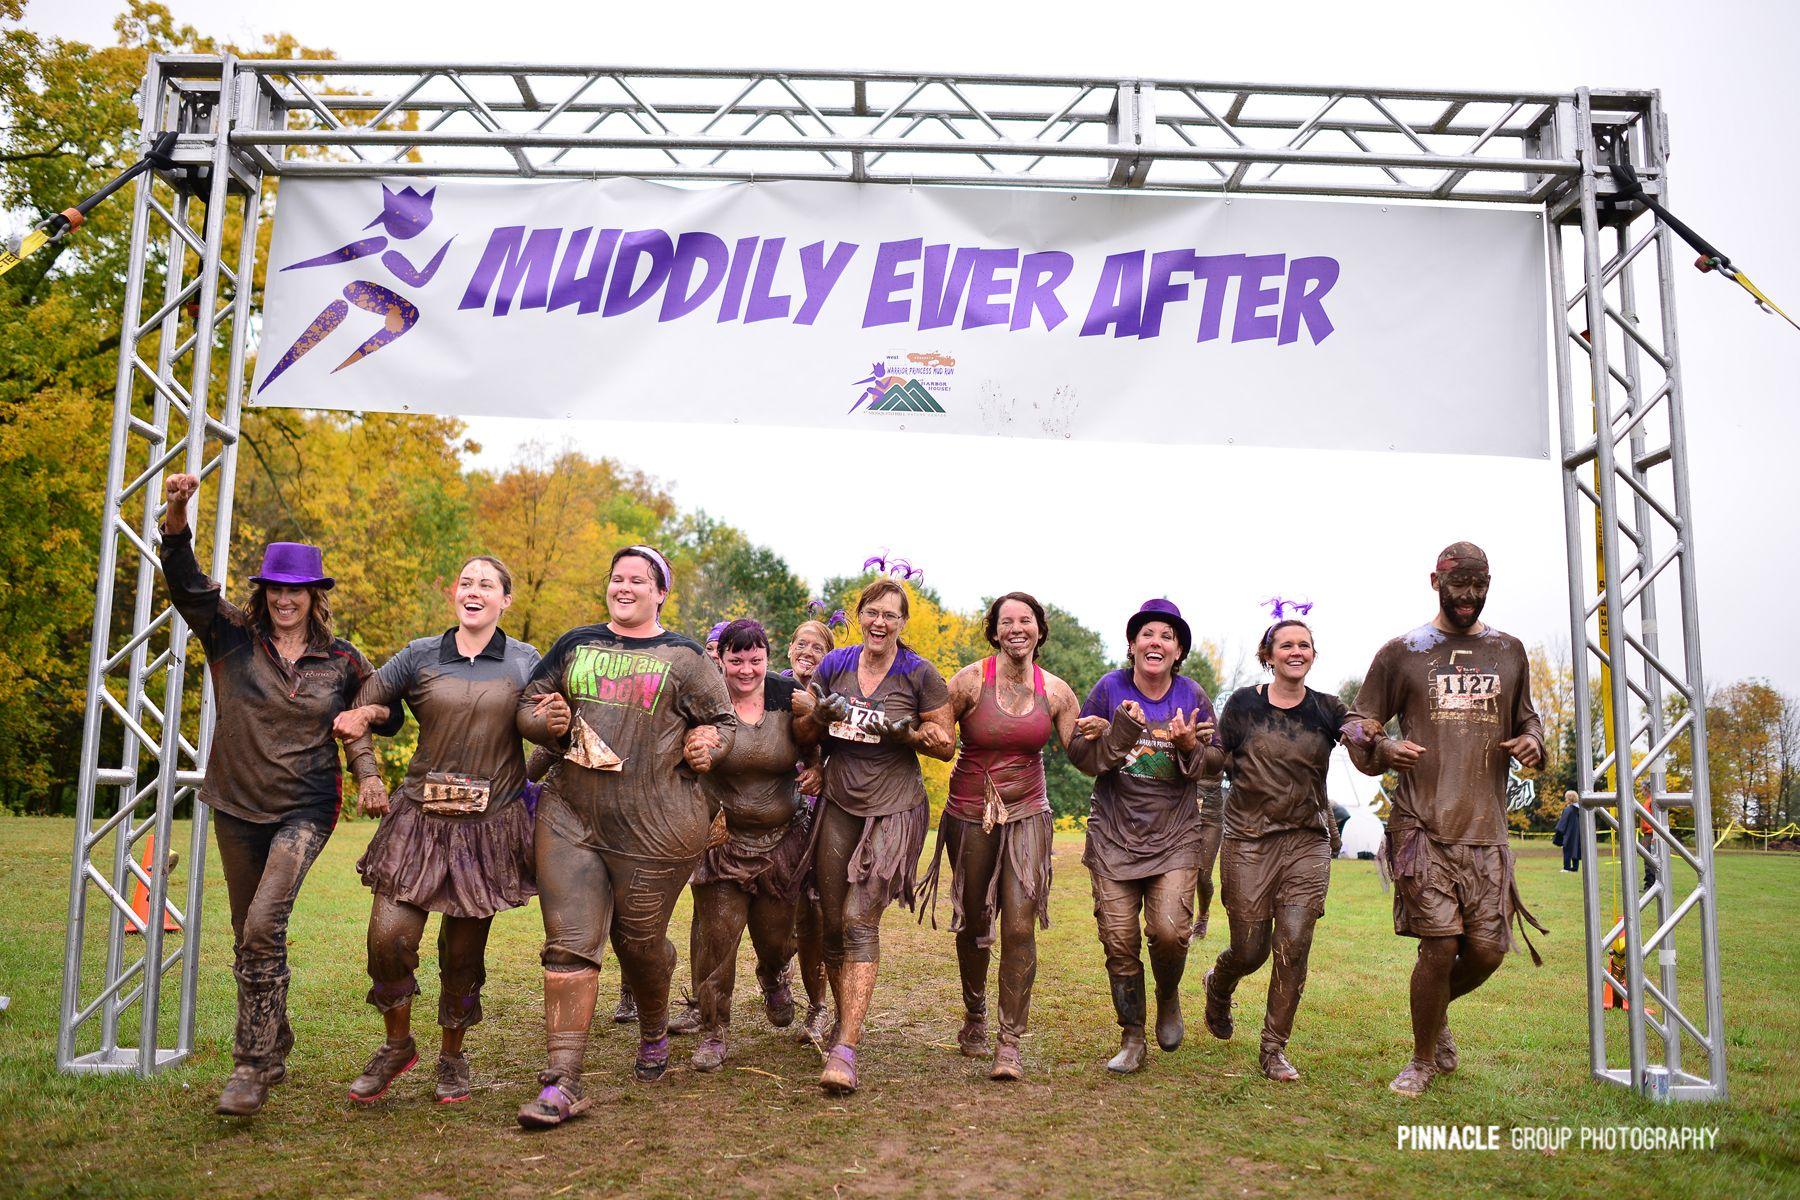 Register today! Warrior Princess Mud Run 2014 - 10-04-2014